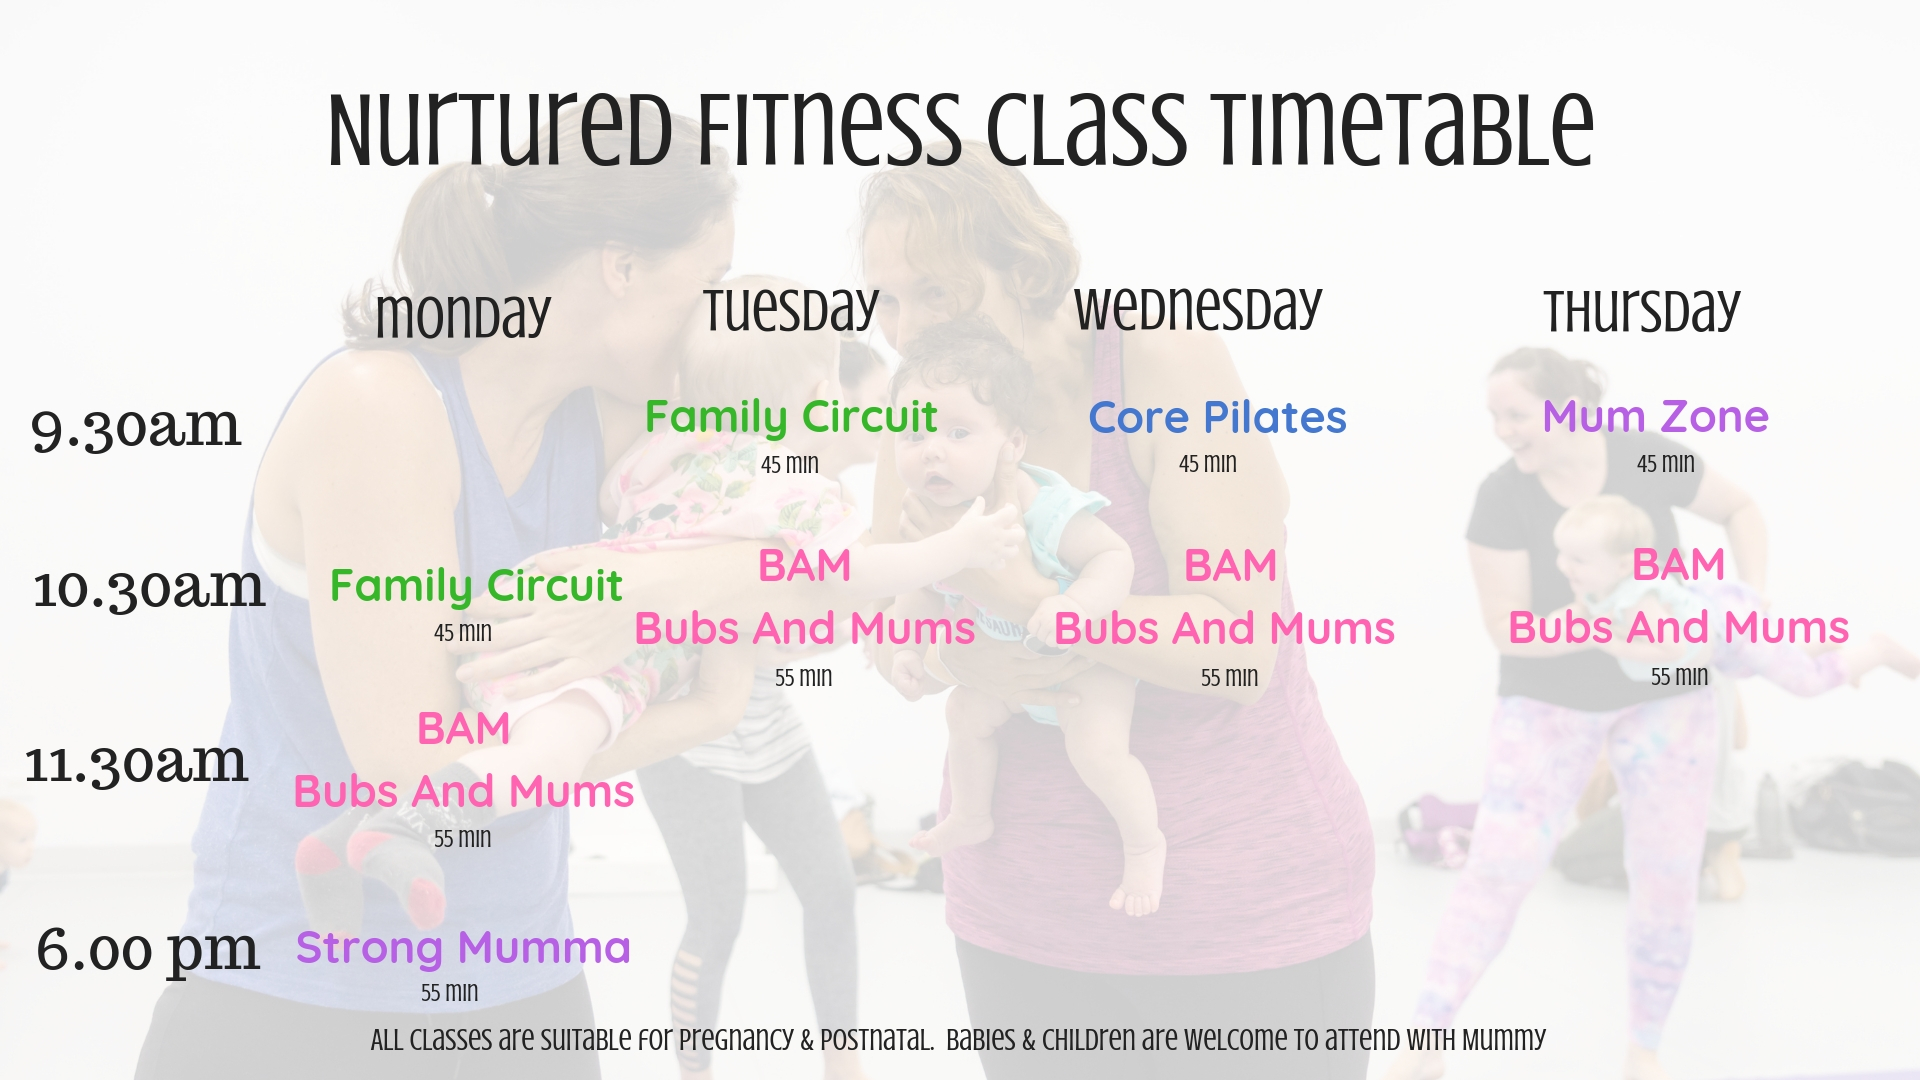 Nurtured Fitness Class Timetable (6)